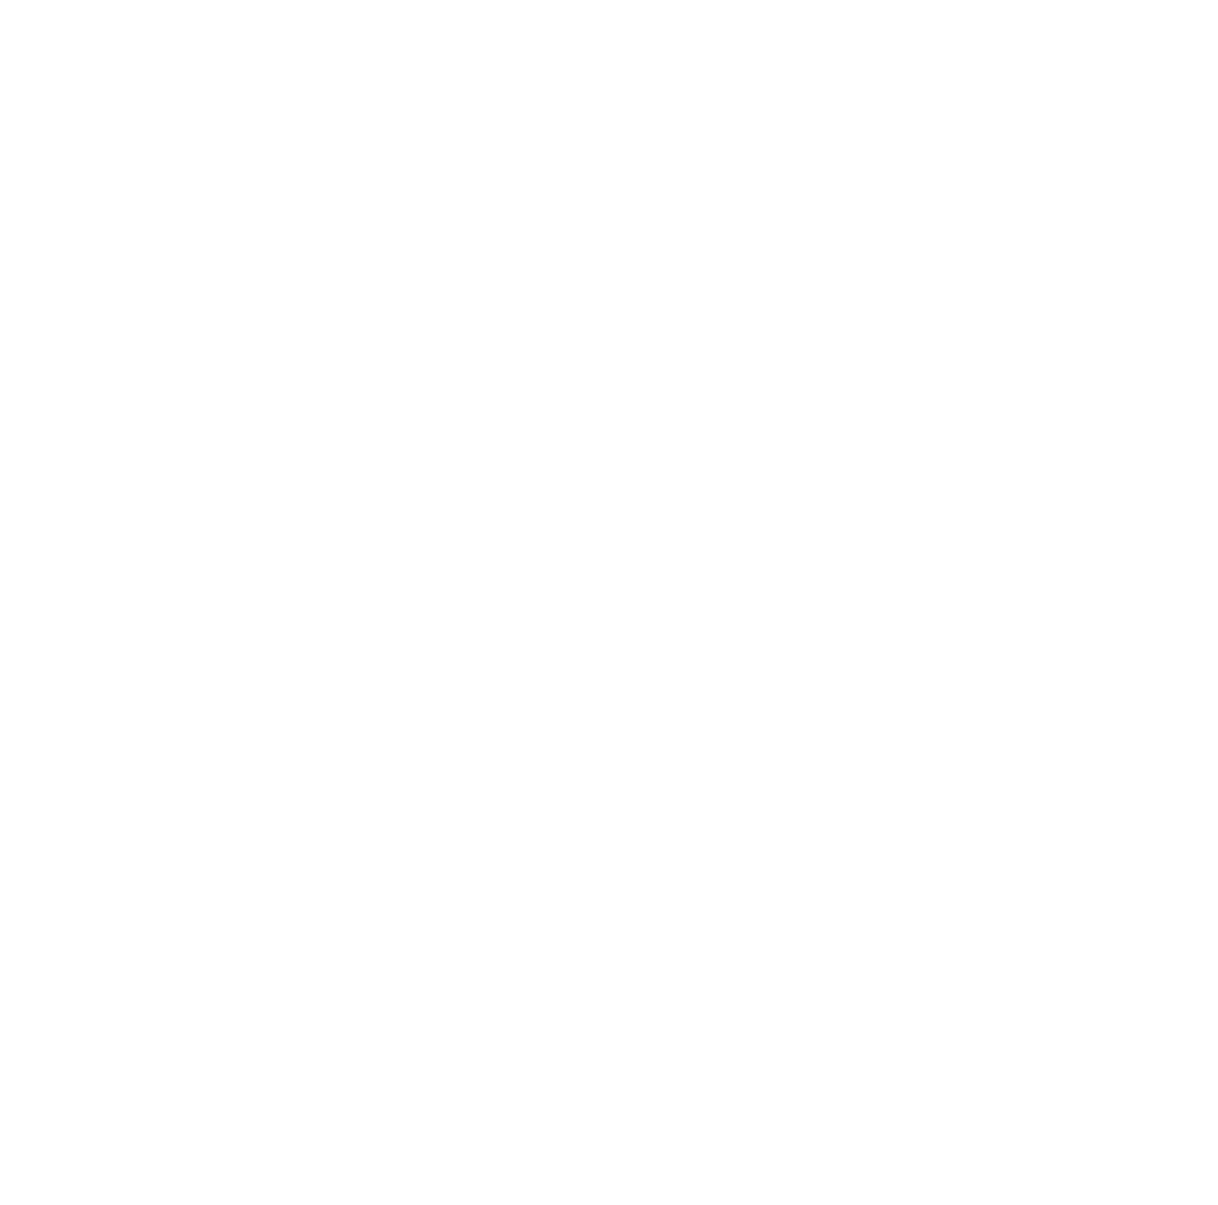 Employment & Industrial Relations